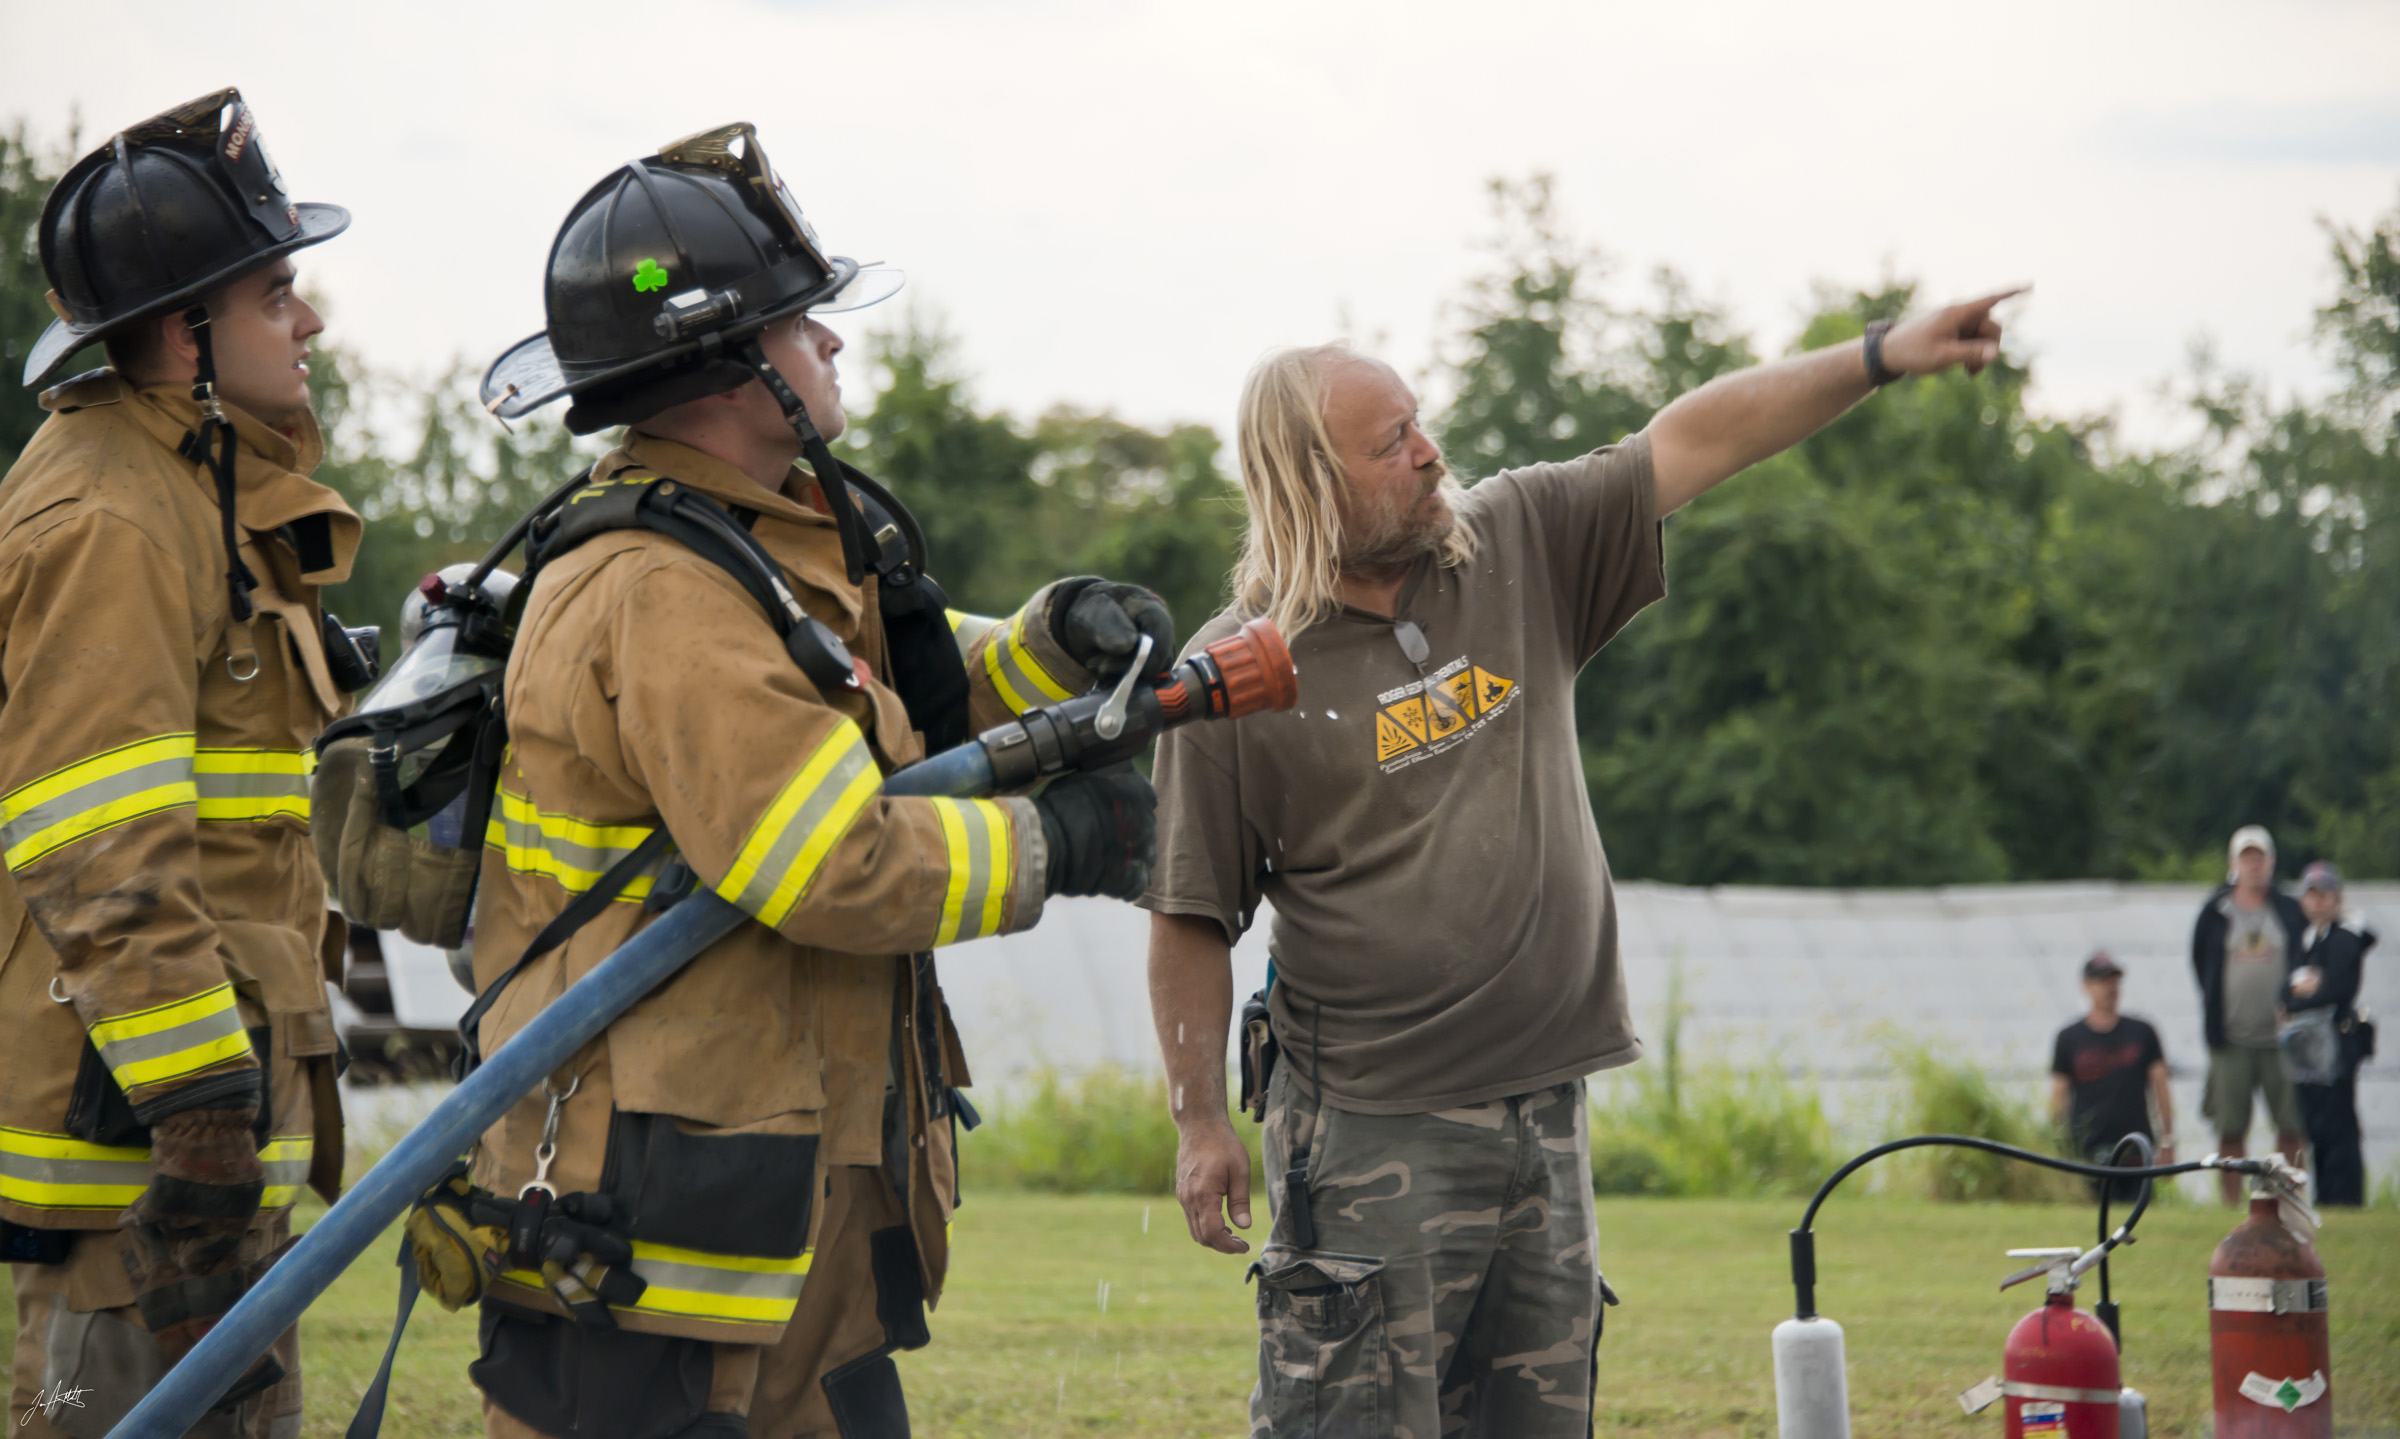 Ray and FiremenBANSHEE